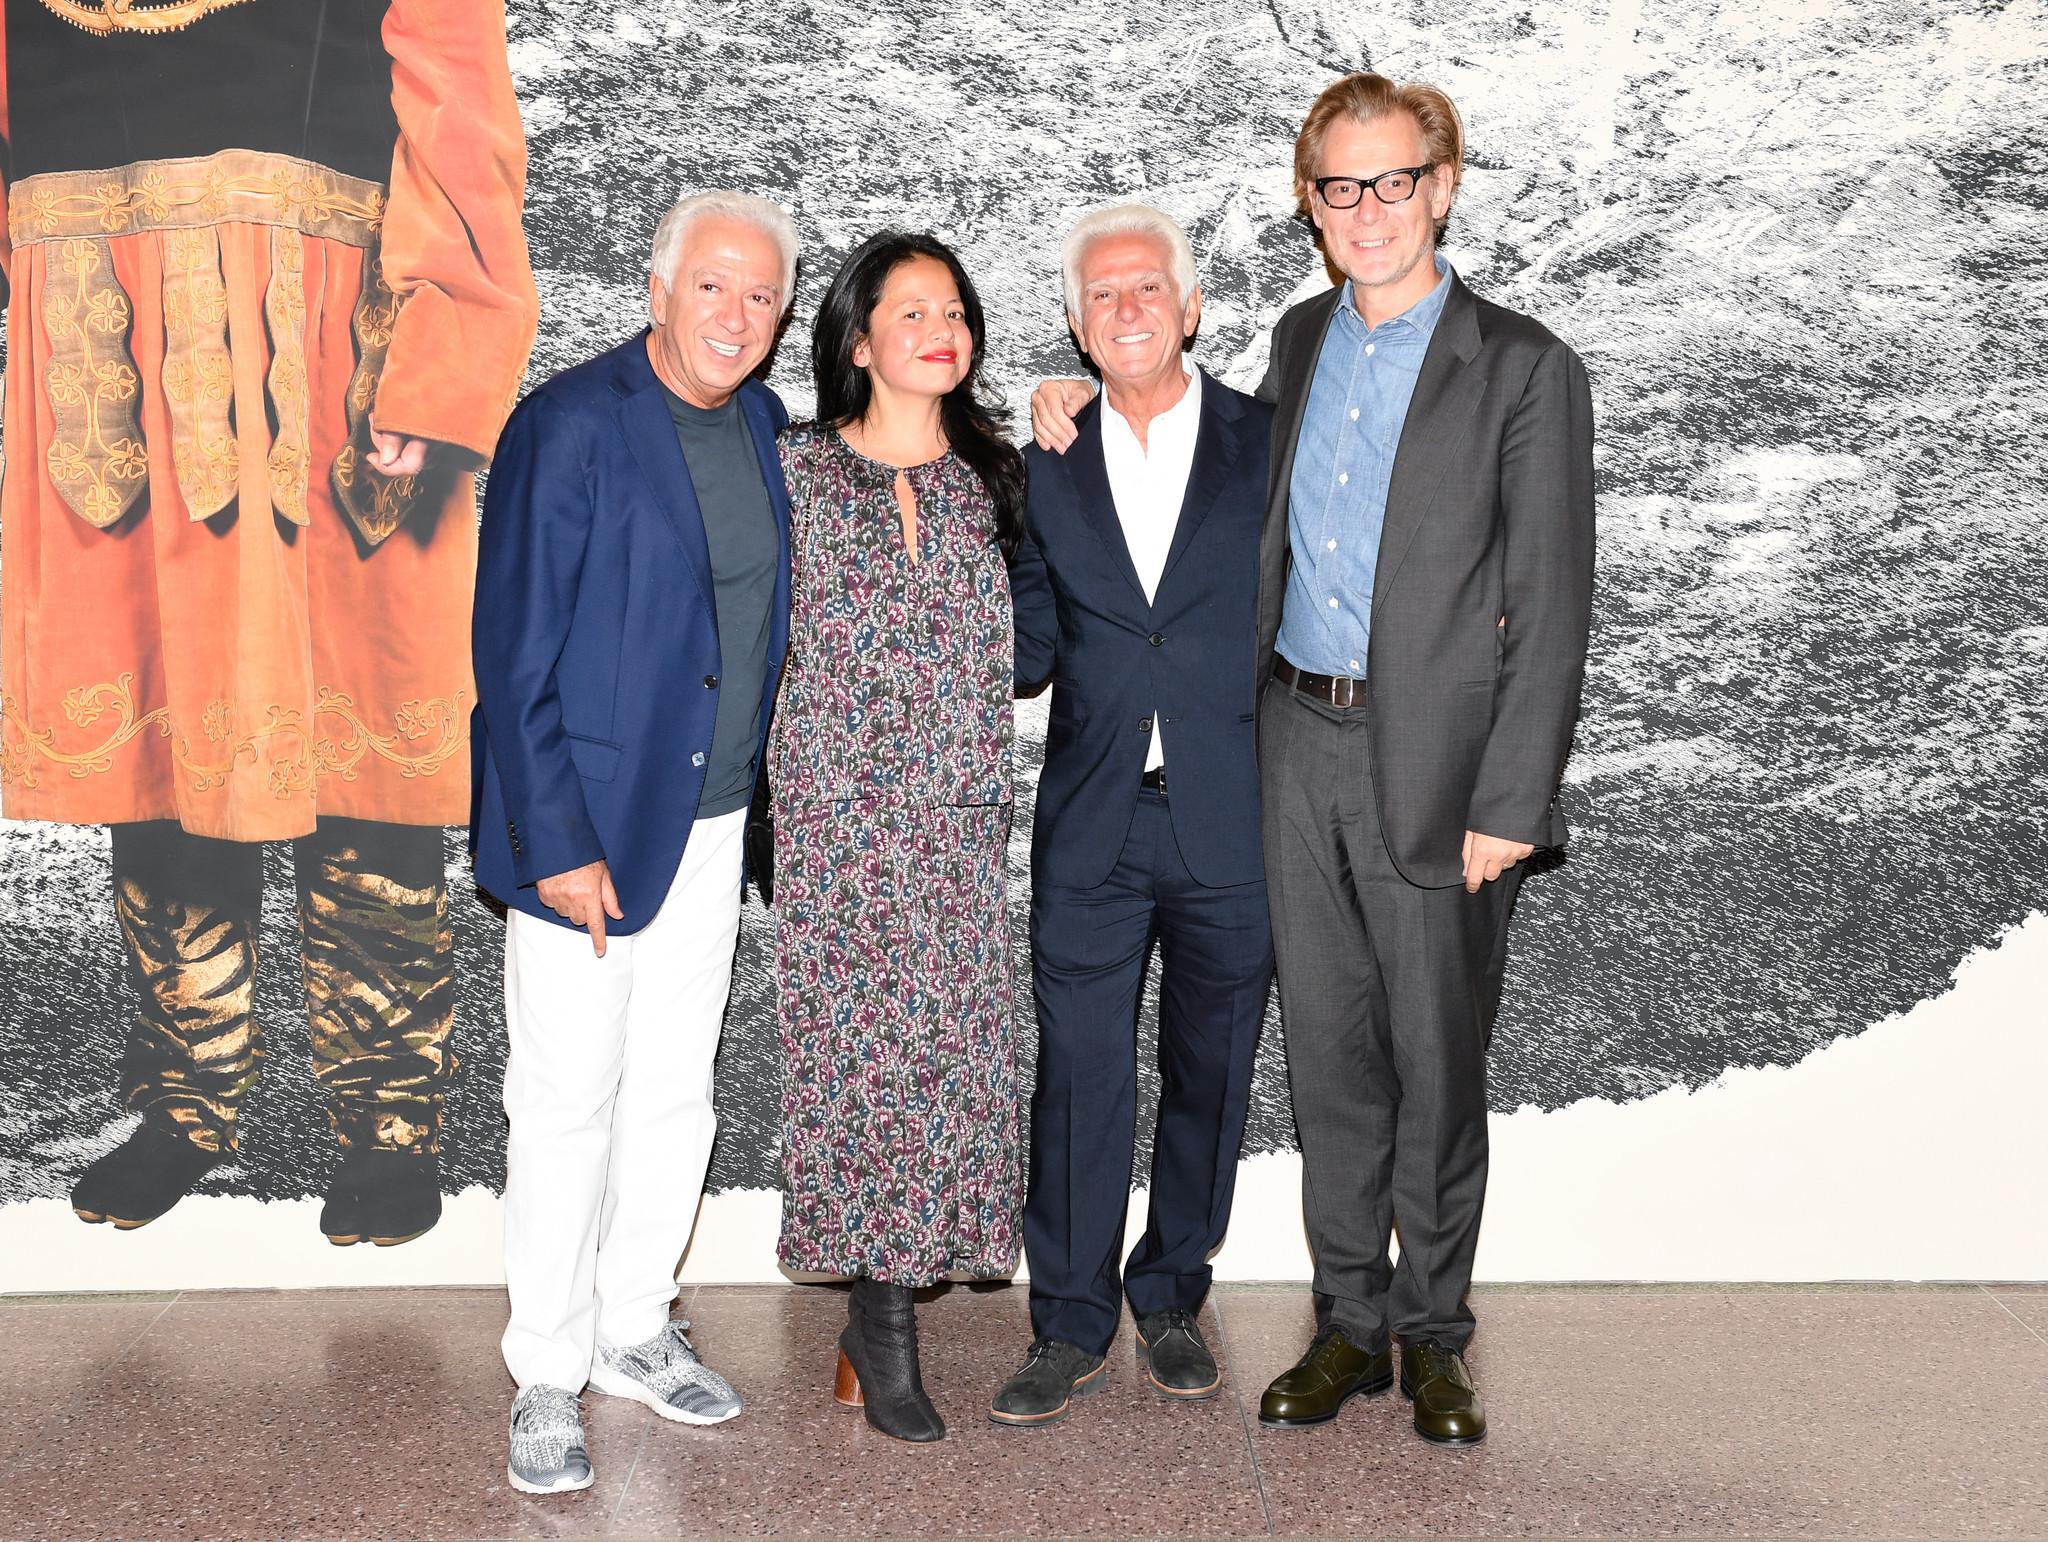 Paul Marciano, Sylvia Chivaratanond, Maurice Marciano and MOCA Director Philippe Vergne.